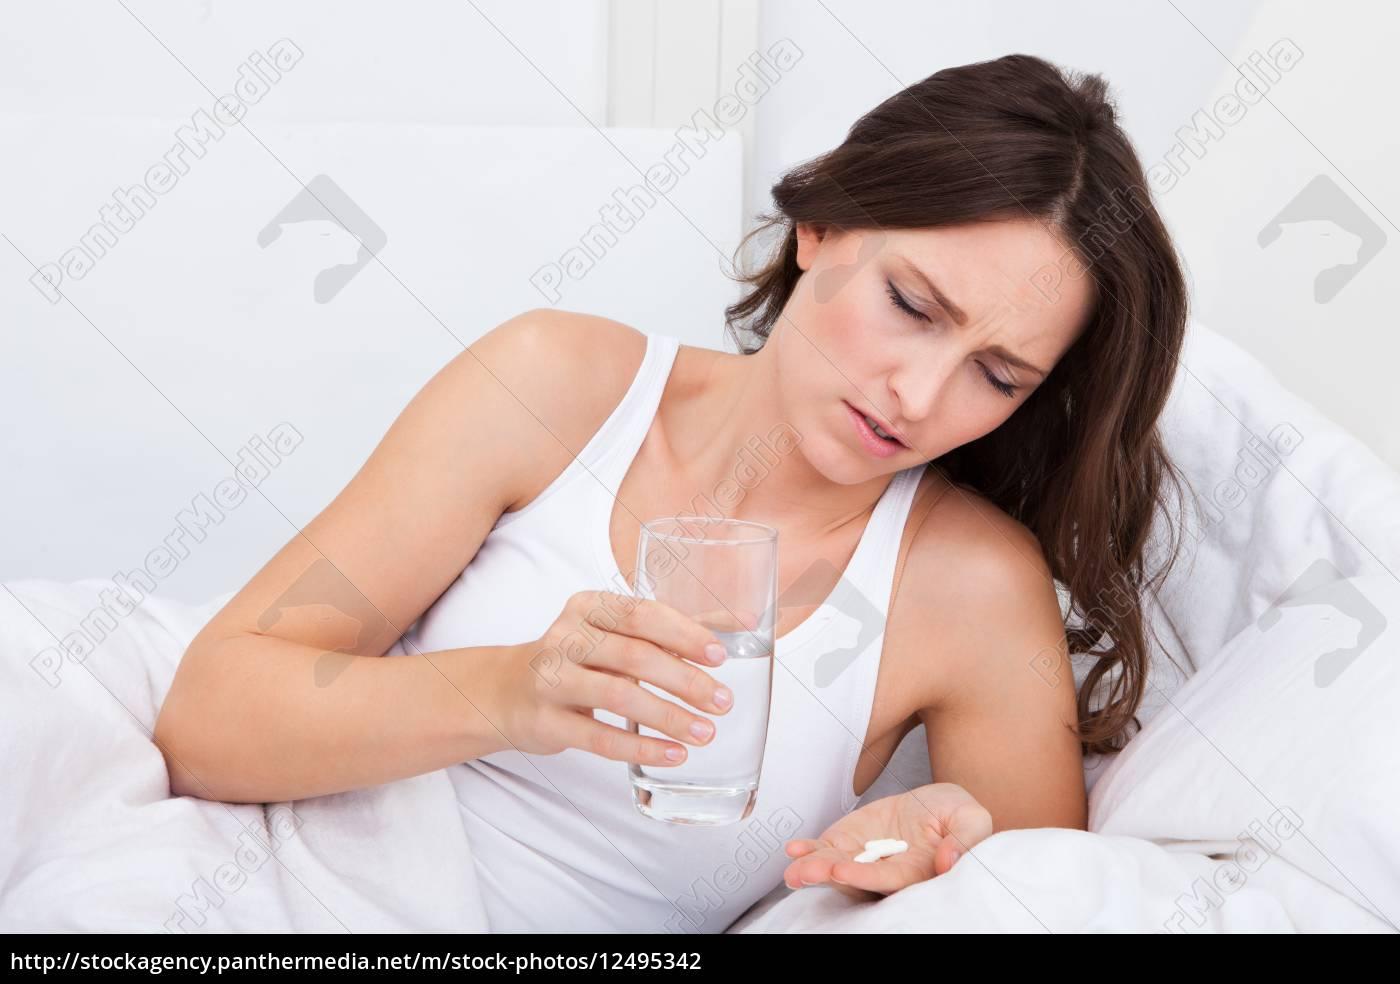 kranke, frau, holding-arzneimittel - 12495342